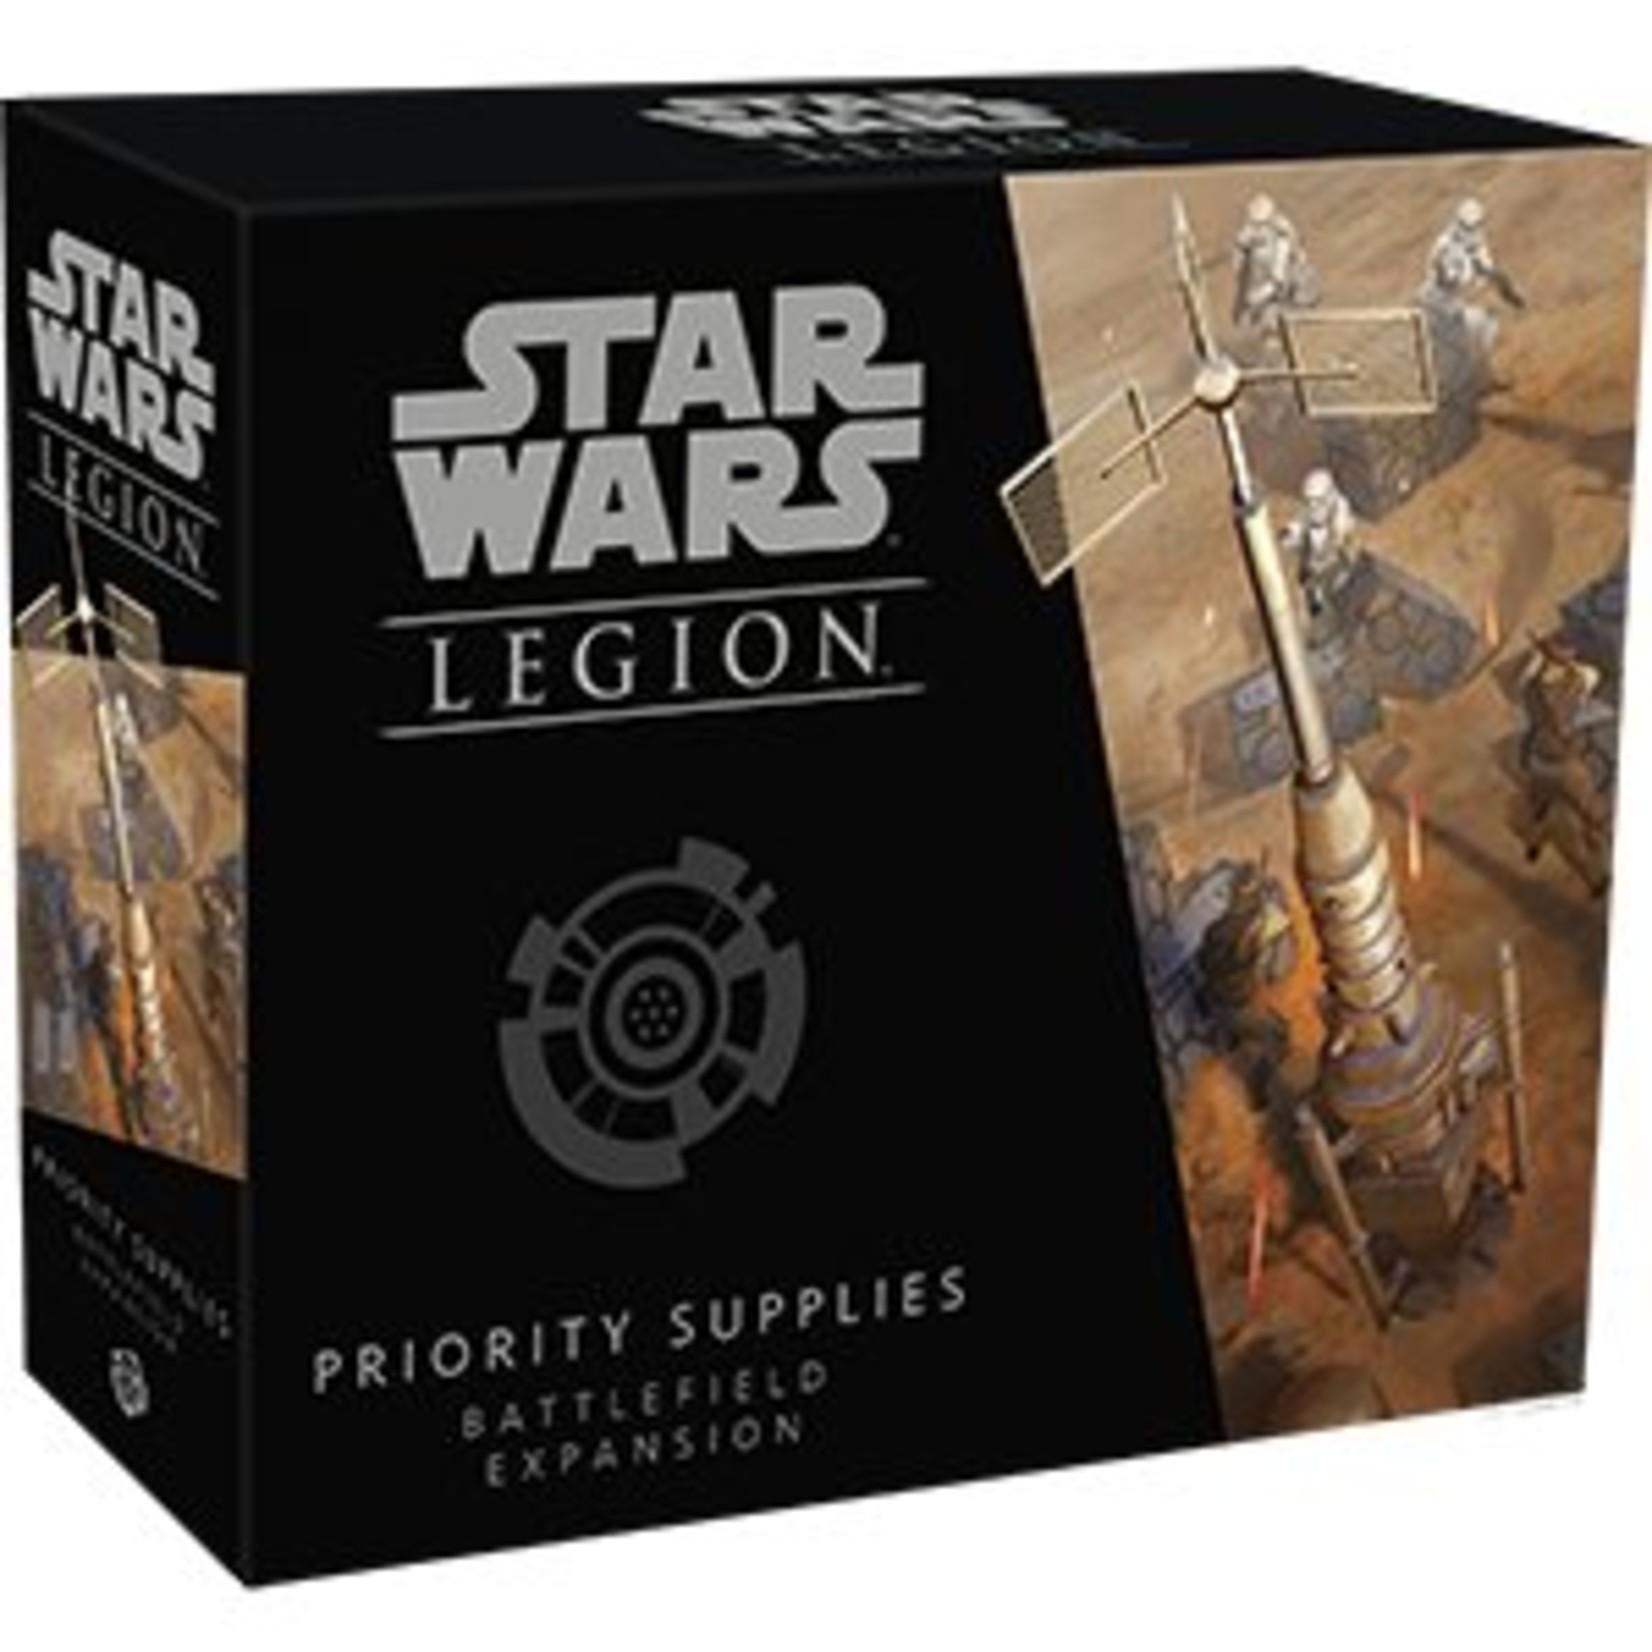 Fantasy Flight Games Star Wars: Legion - Priority Supplies Battlefield Expansion